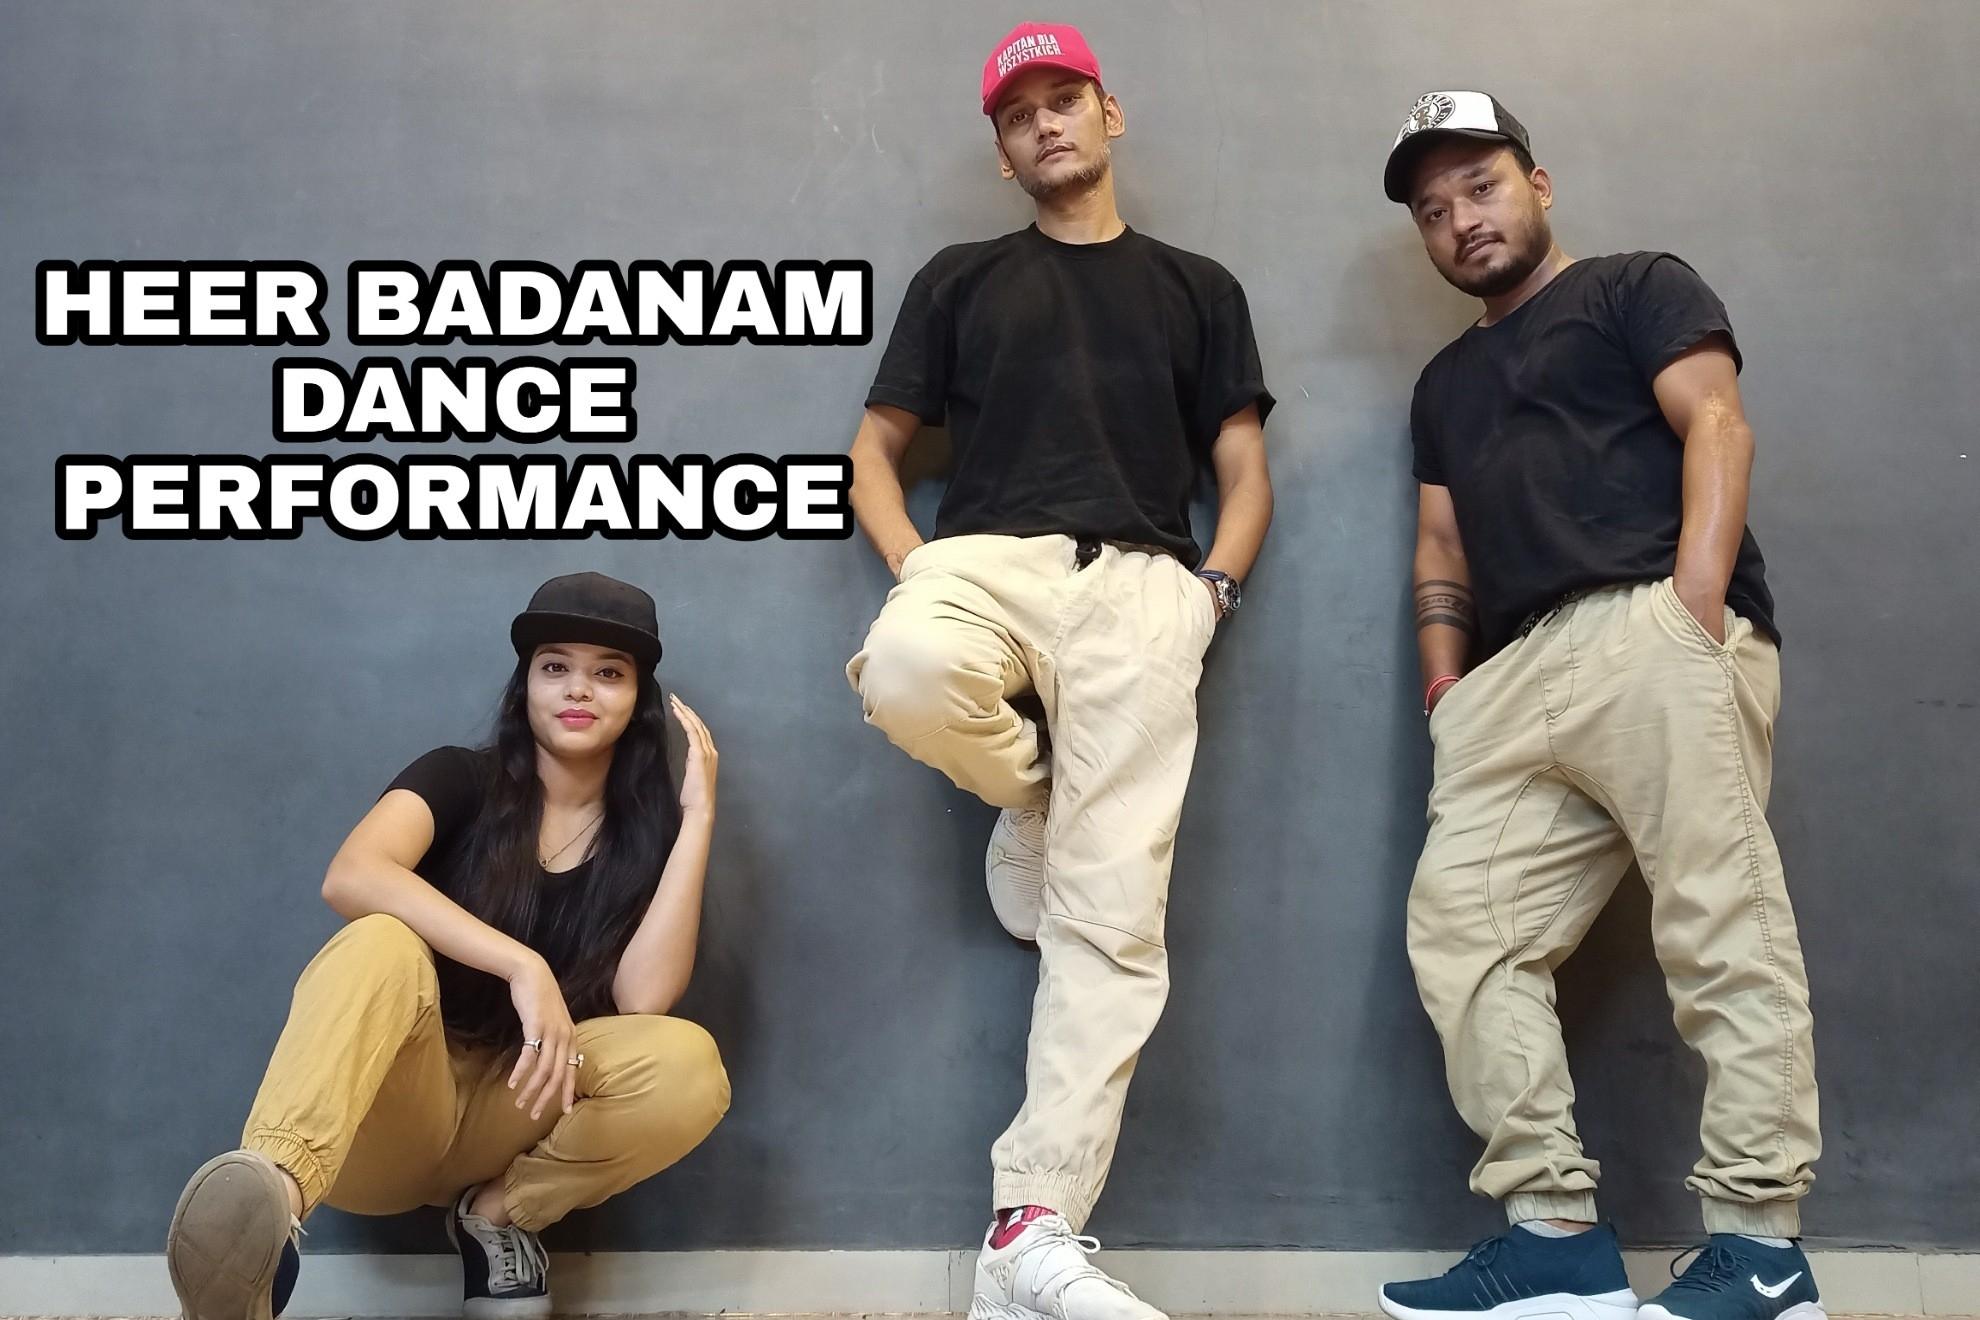 HEER BADANAM DANCE PERFORMANCE